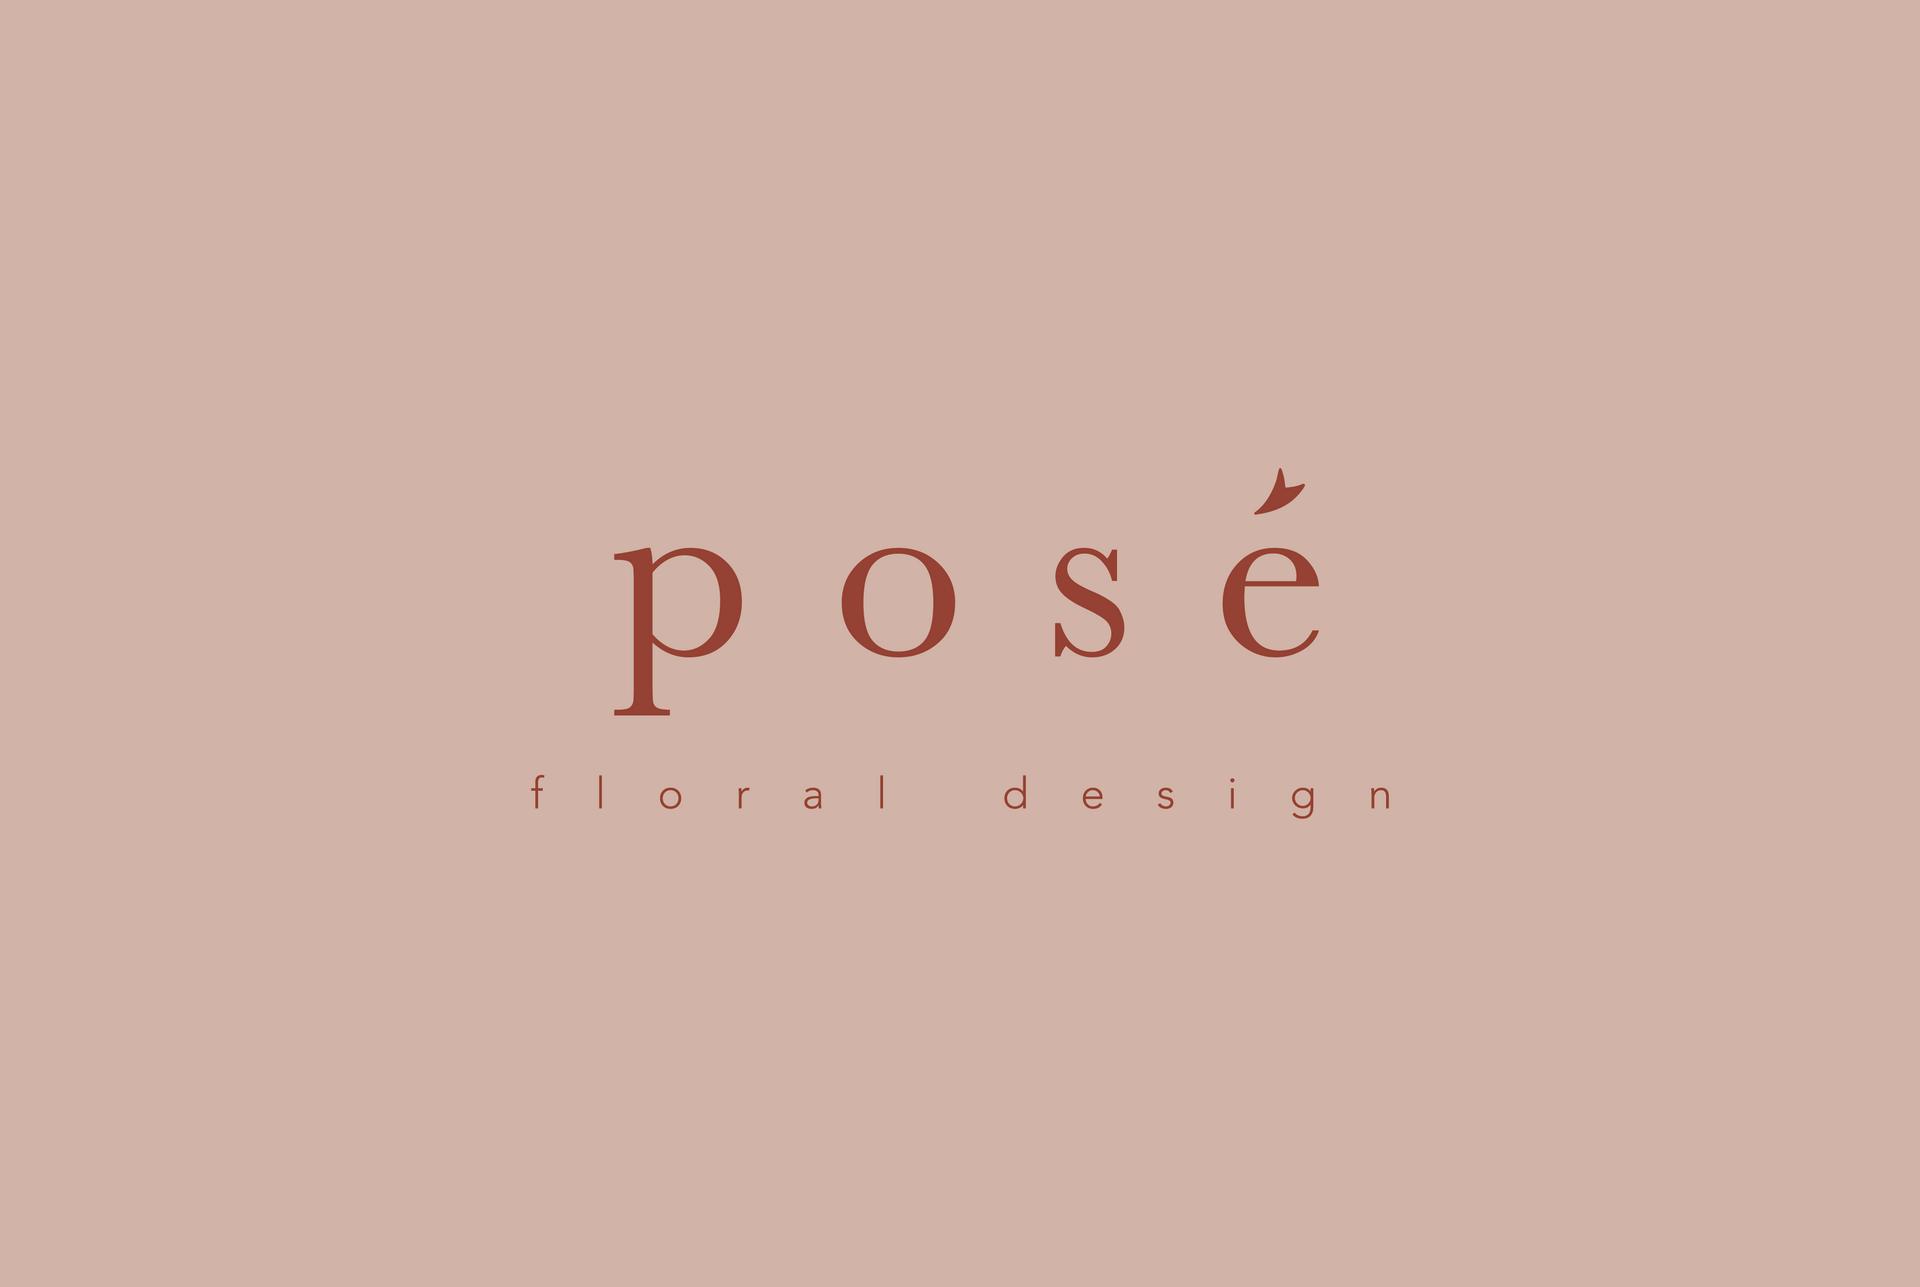 Pose Flowers Branding | Brand Identity Design by Fresh Leaf Creative